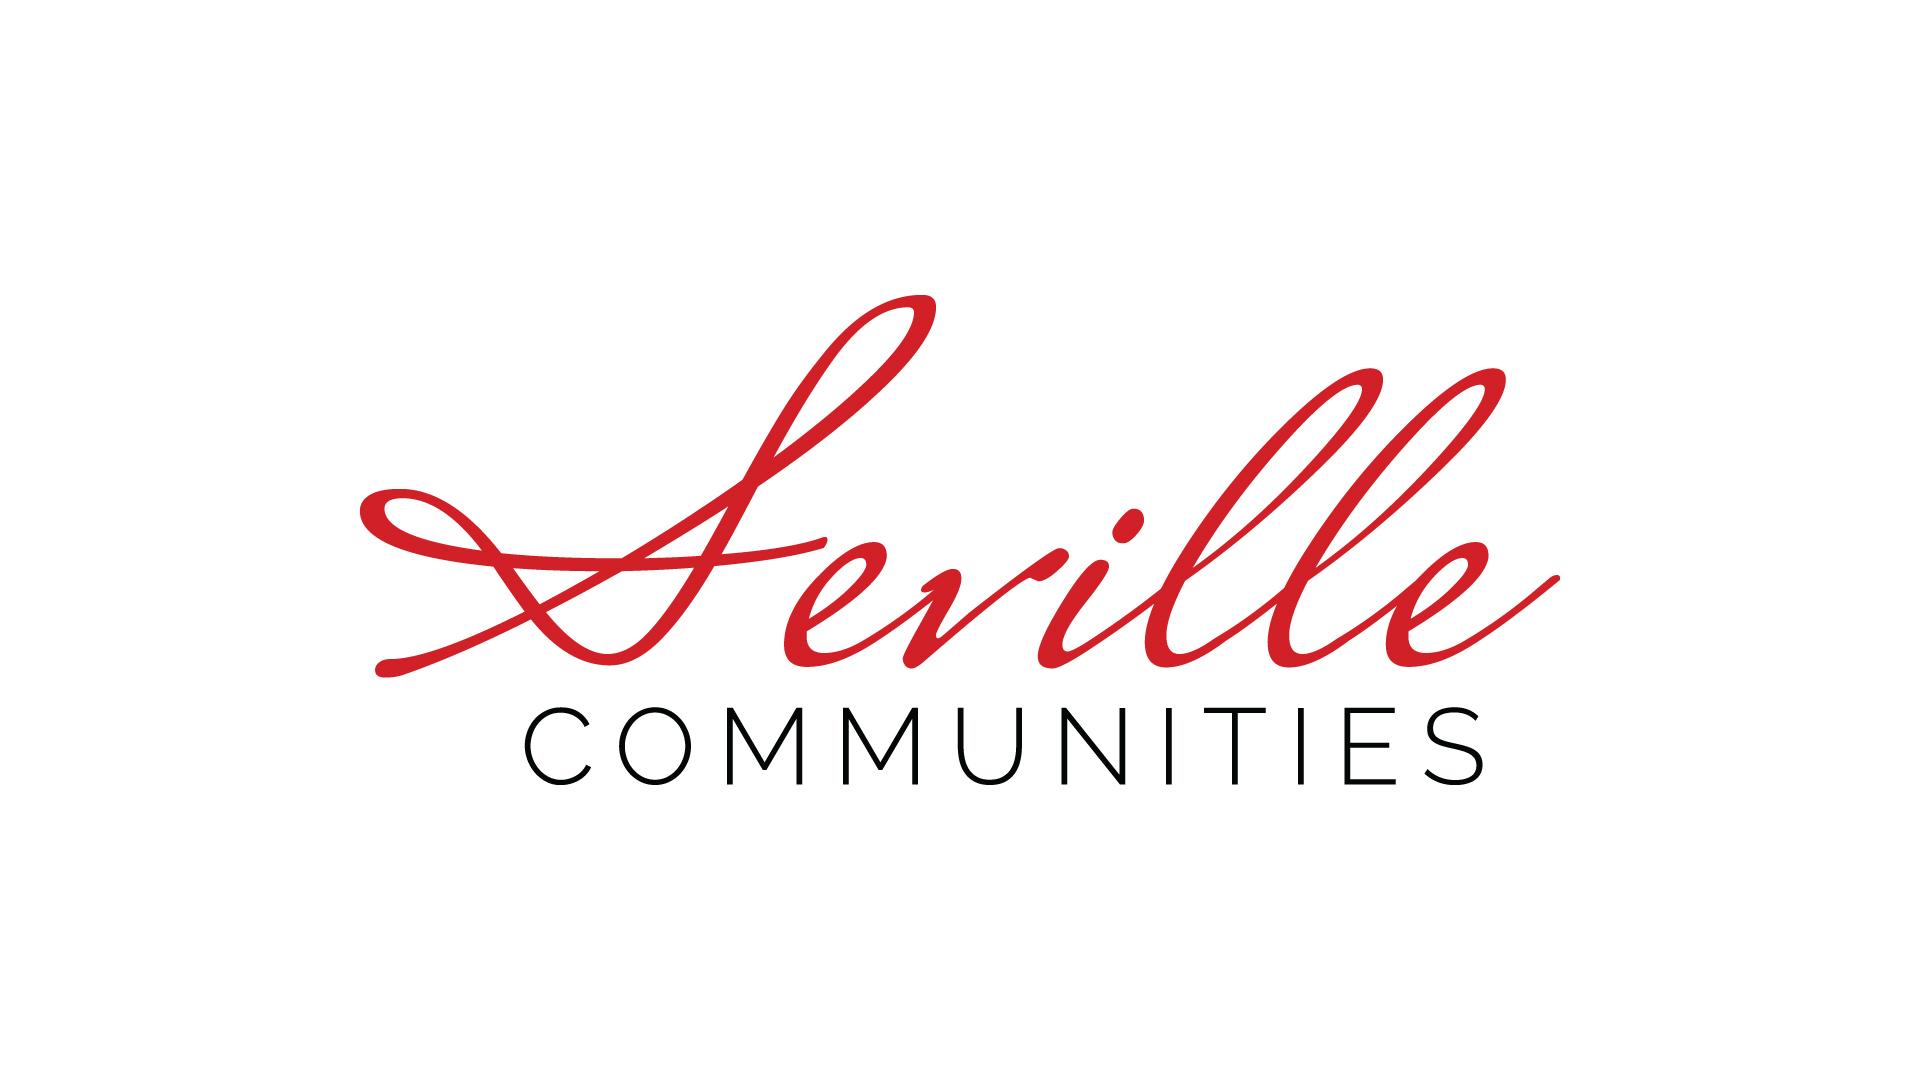 Speros Web Design - Seville Communities